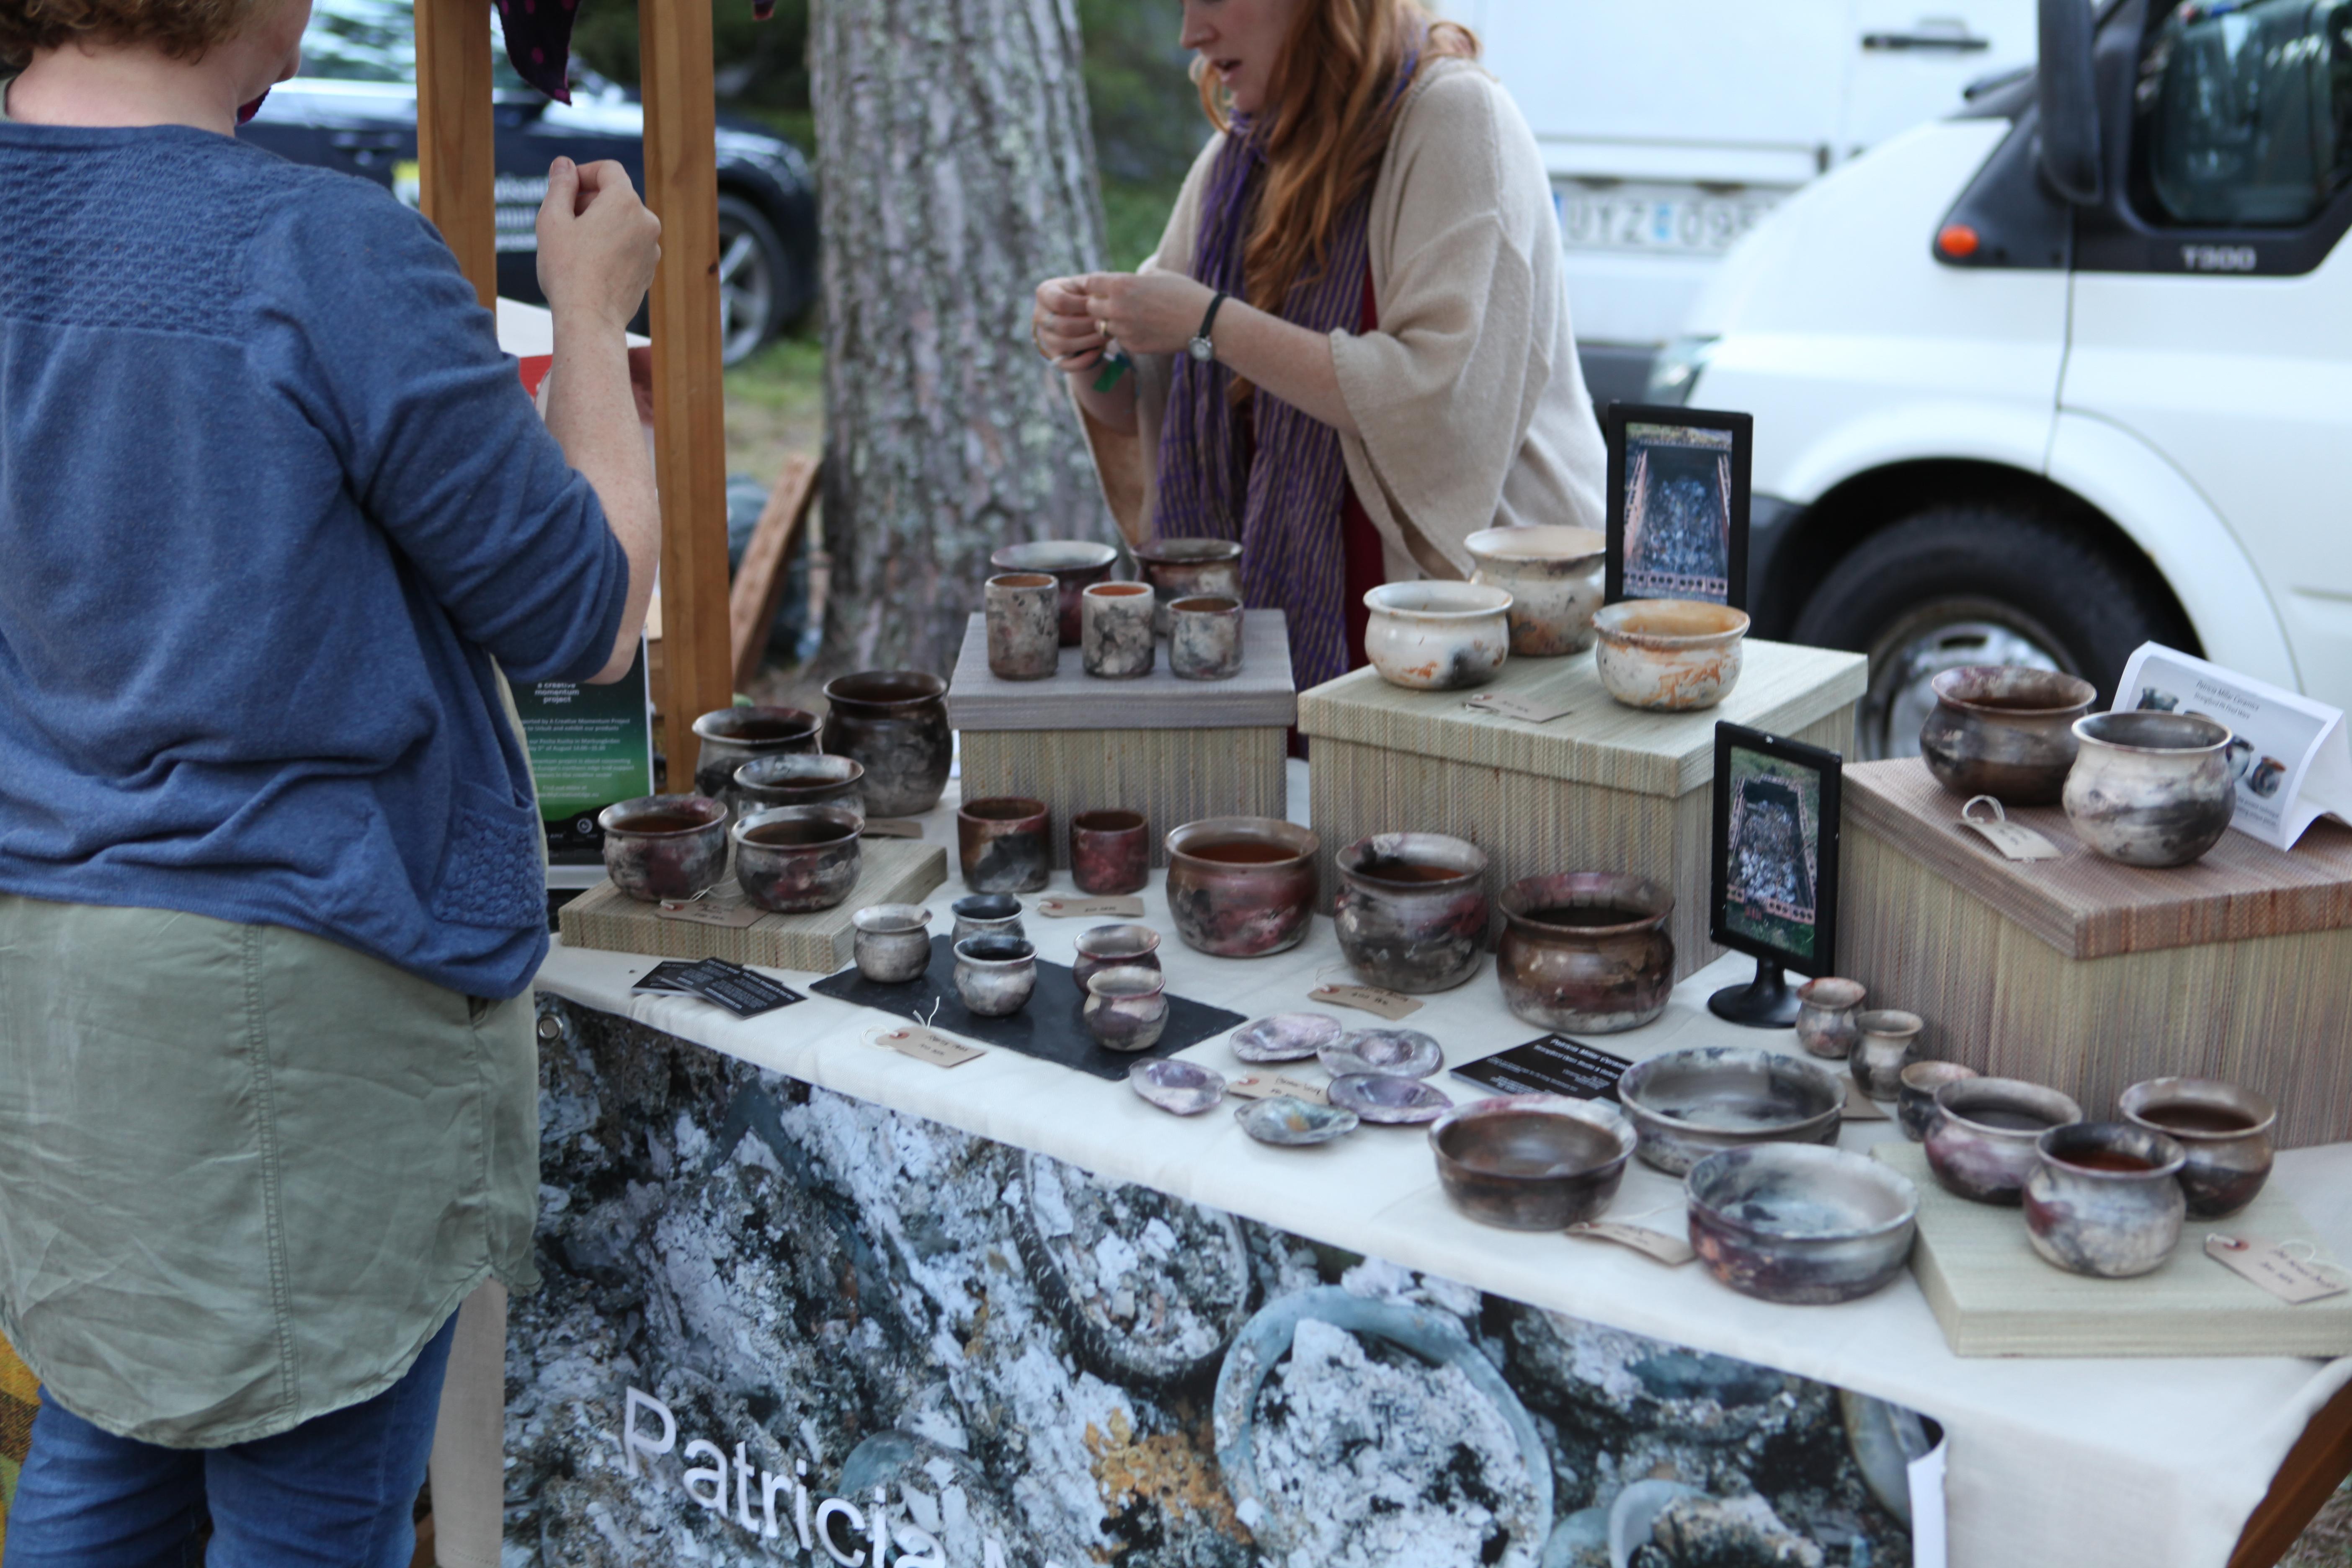 Local Ceramics Big Hit at Swedish Festival - Armagh City, Banbridge and Craigavon Borough Council